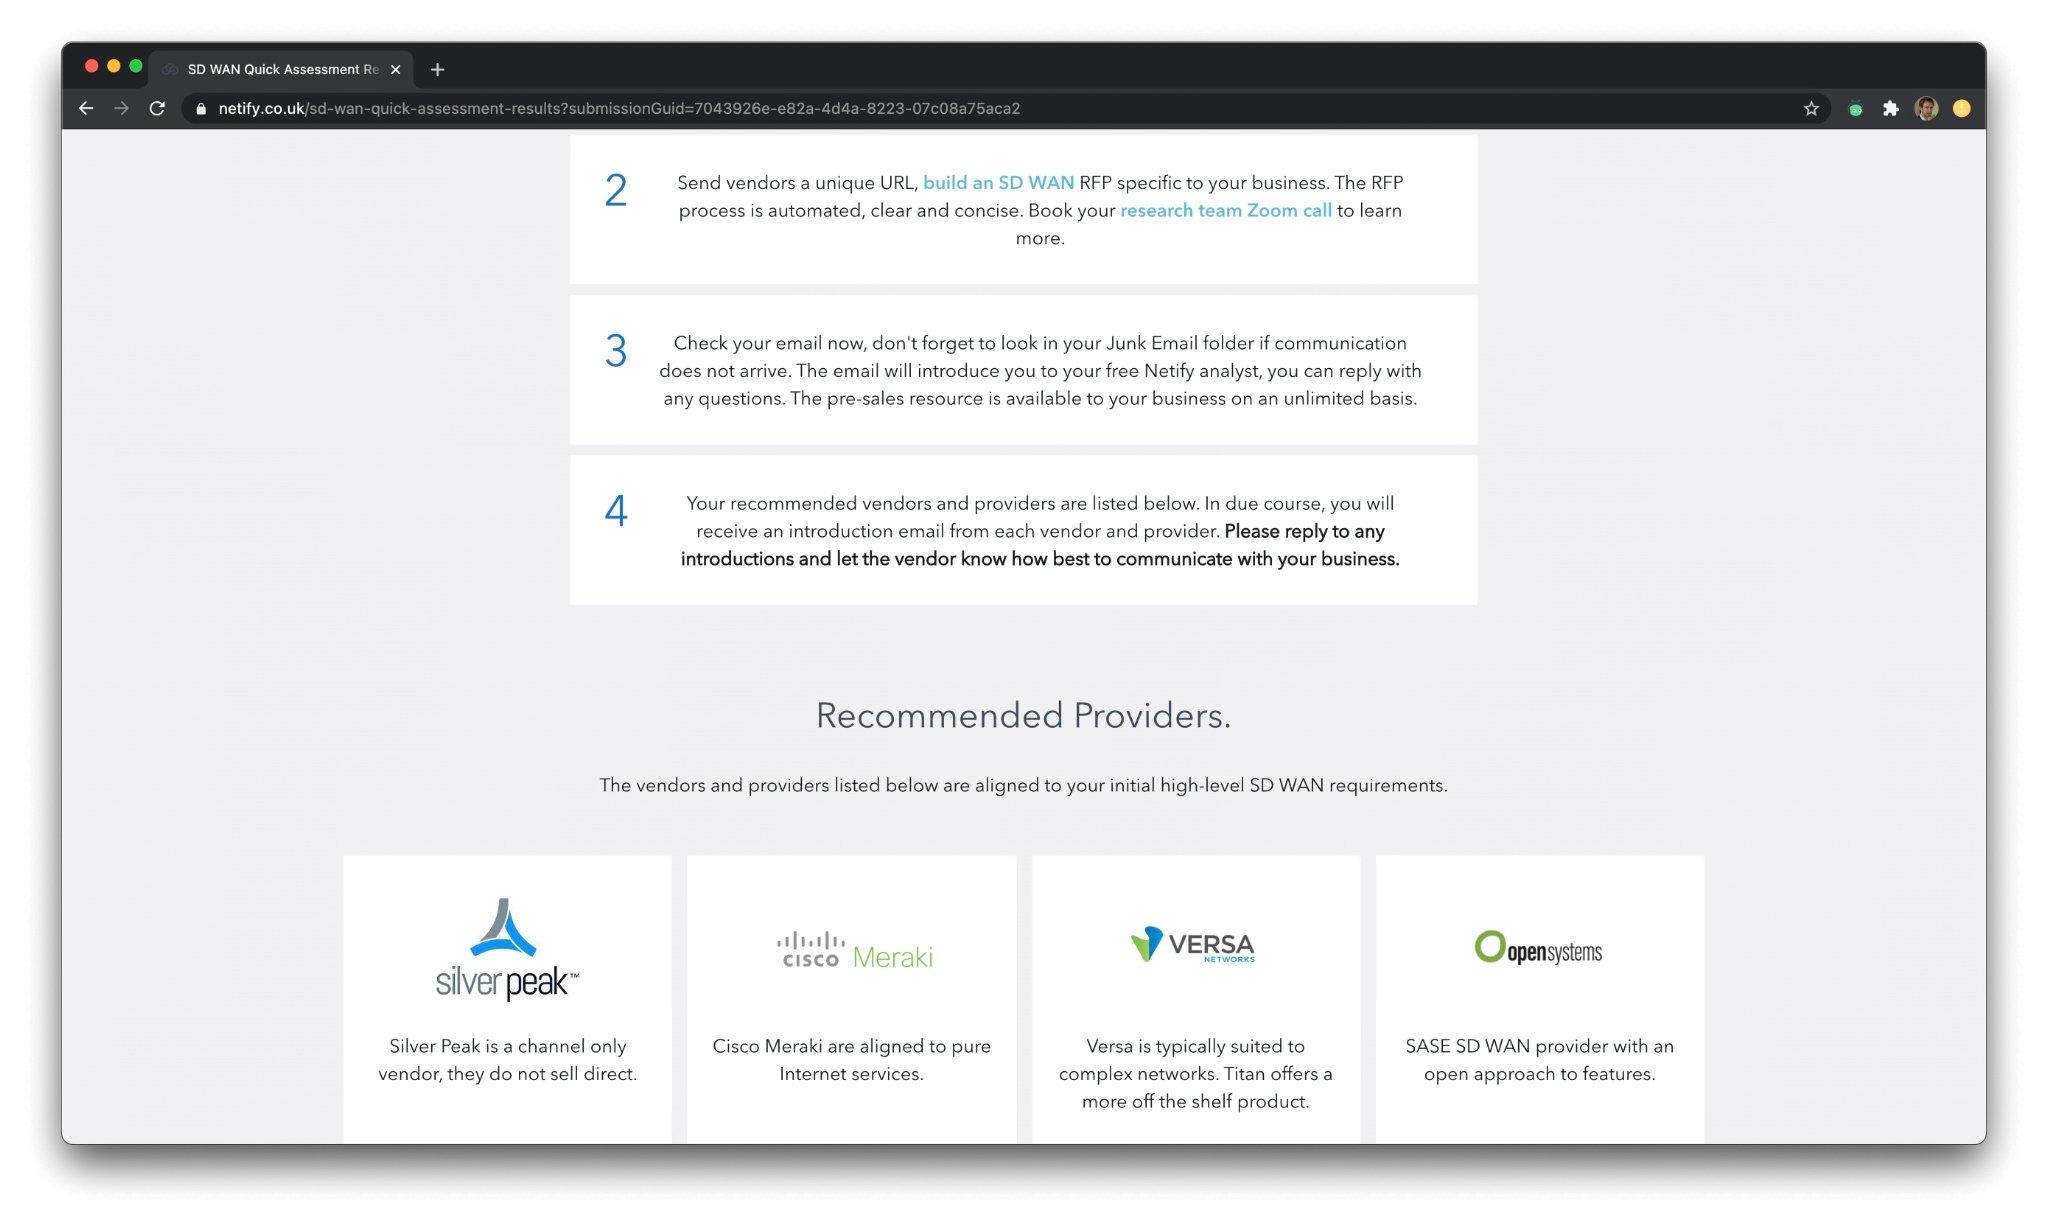 SD WAN Providers - Score my providers